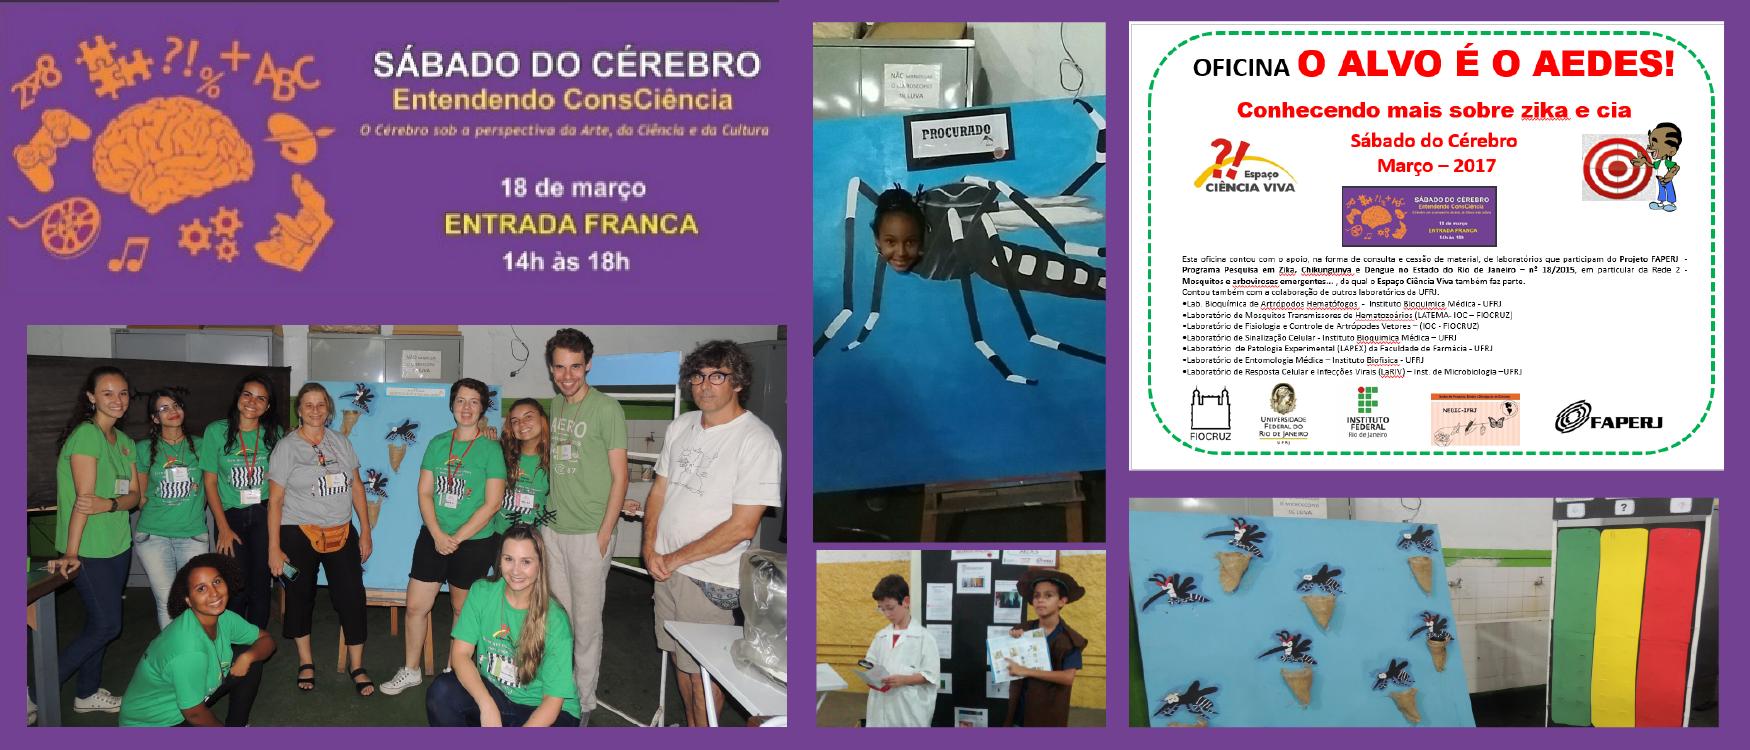 "OFICINA:  AEDES – ZIKA e cia"": O alvo é o Aedes!"